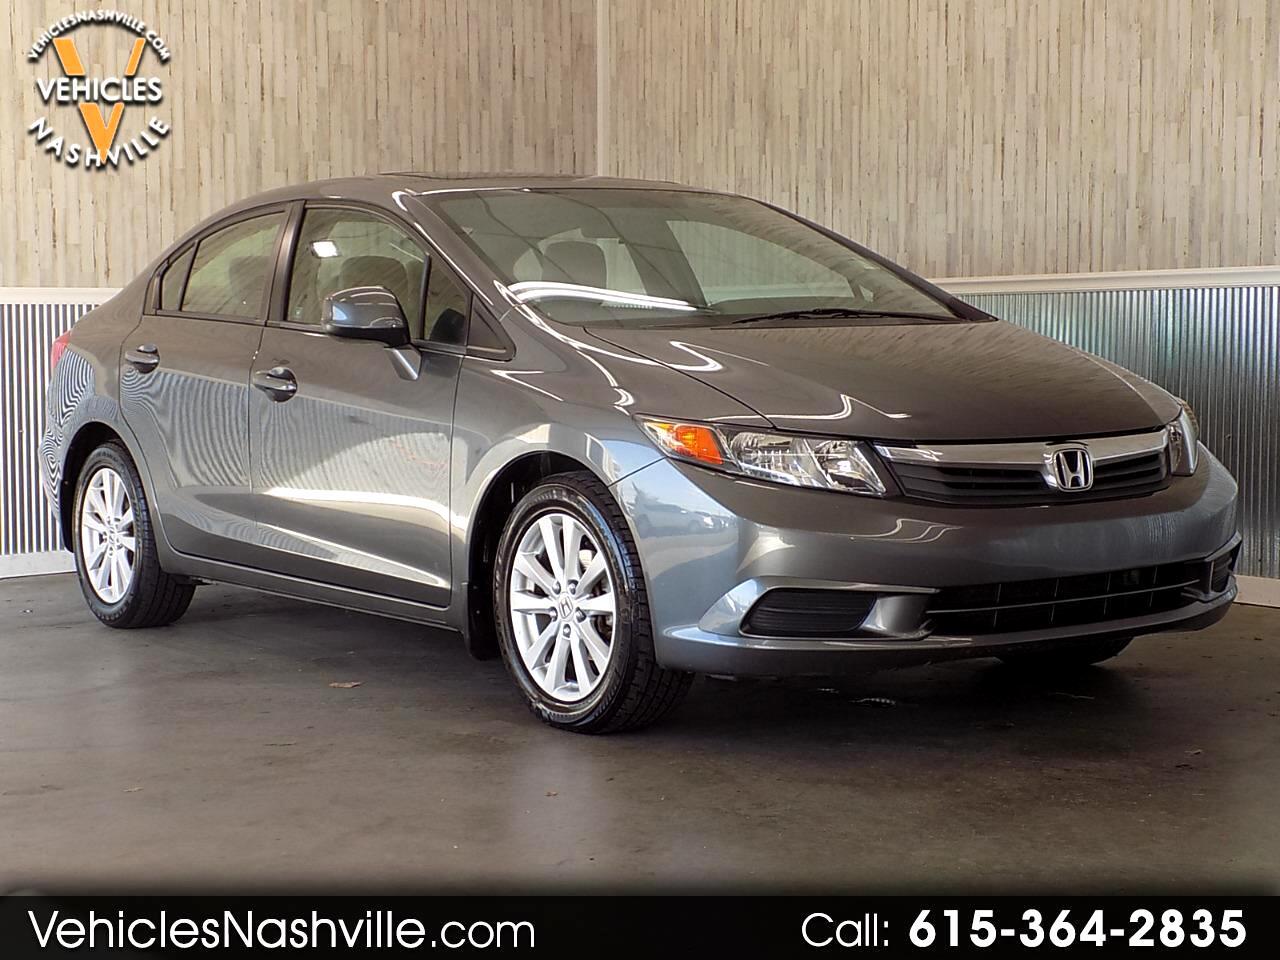 2012 Honda Civic 4dr Sdn EX Auto